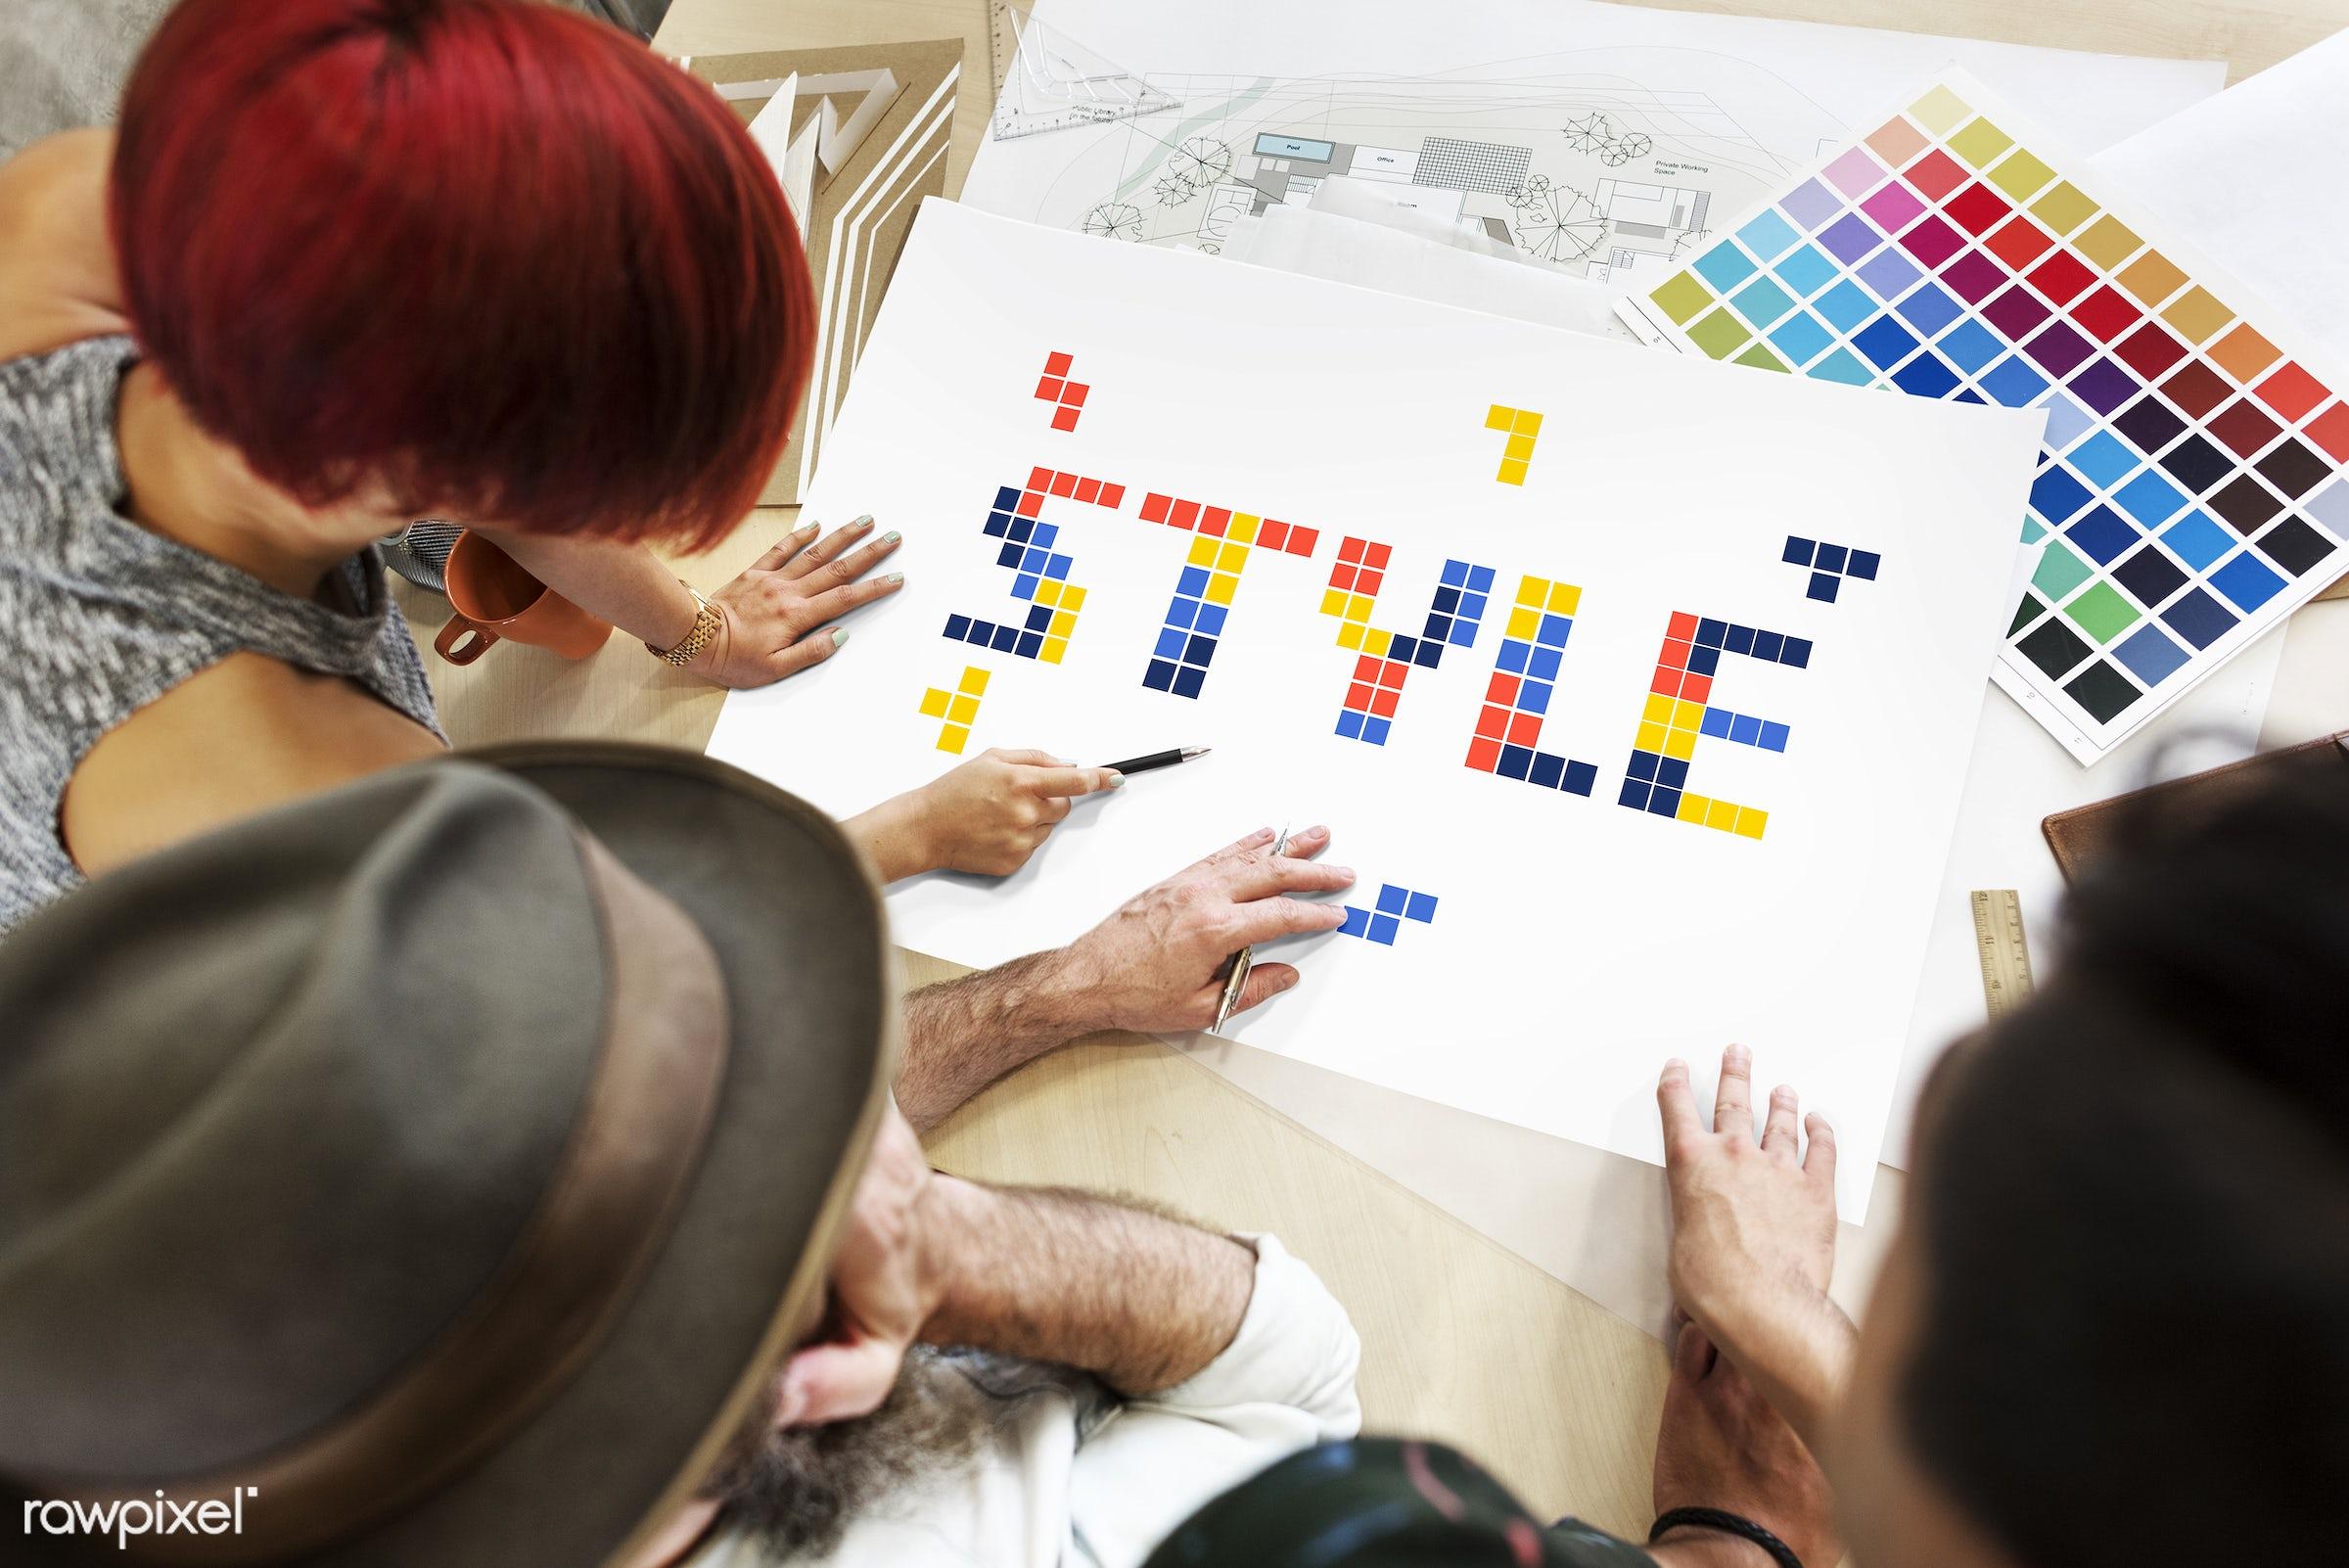 8 bit, art, artistry, block, color chart, colors, creative, creativity, design, discussion, female, game, graphic, graphics...